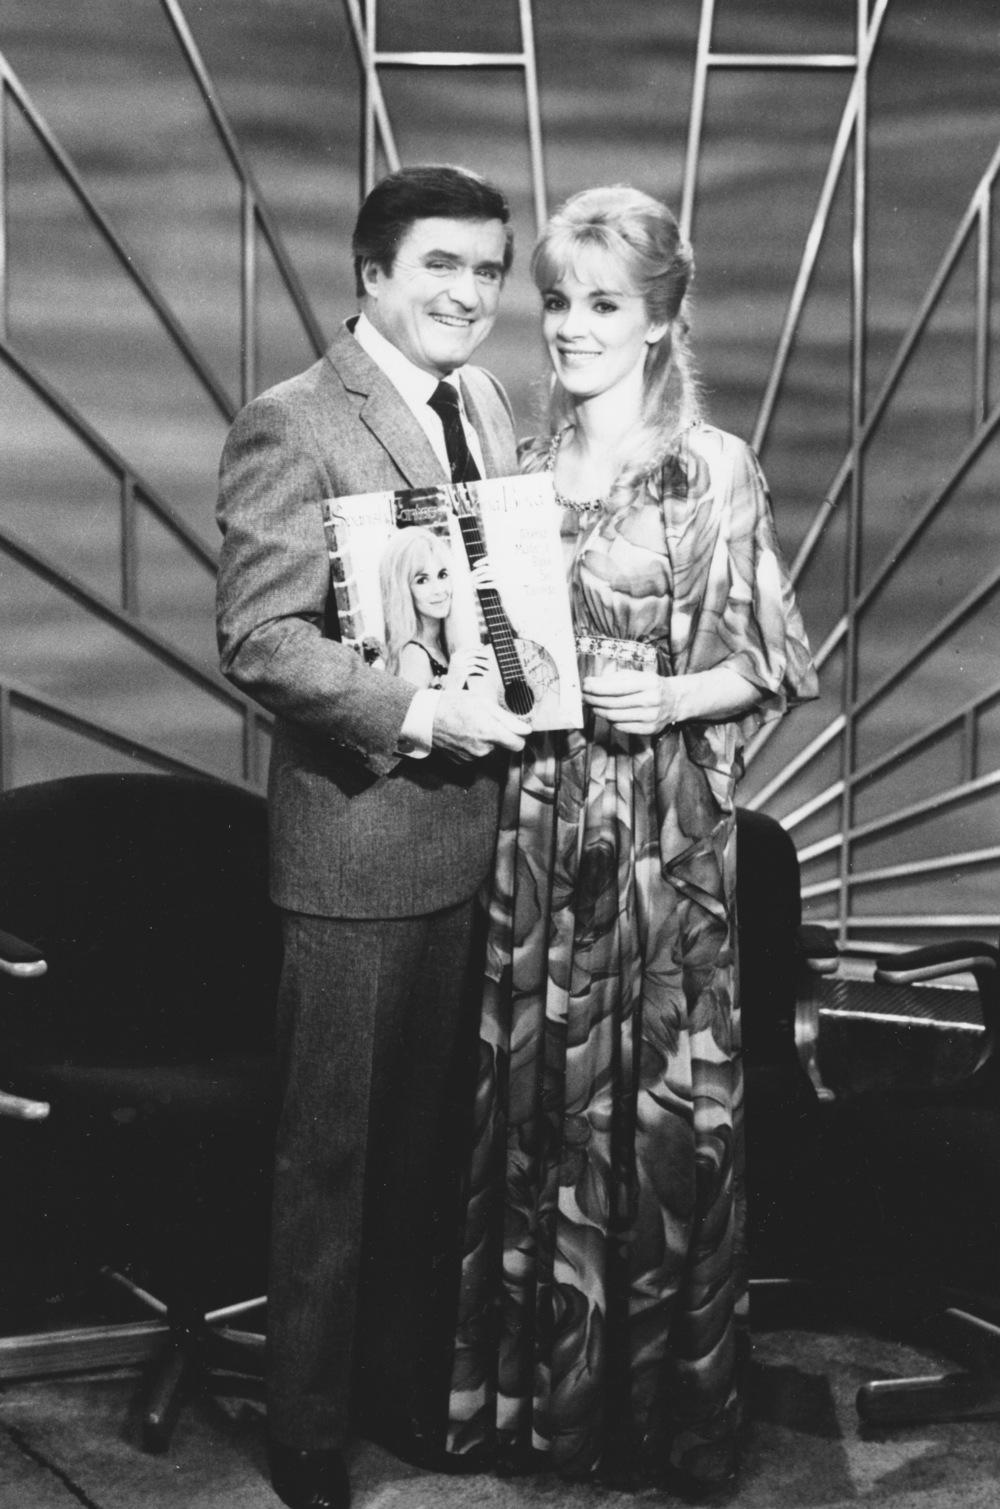 1980 Mike Douglas show